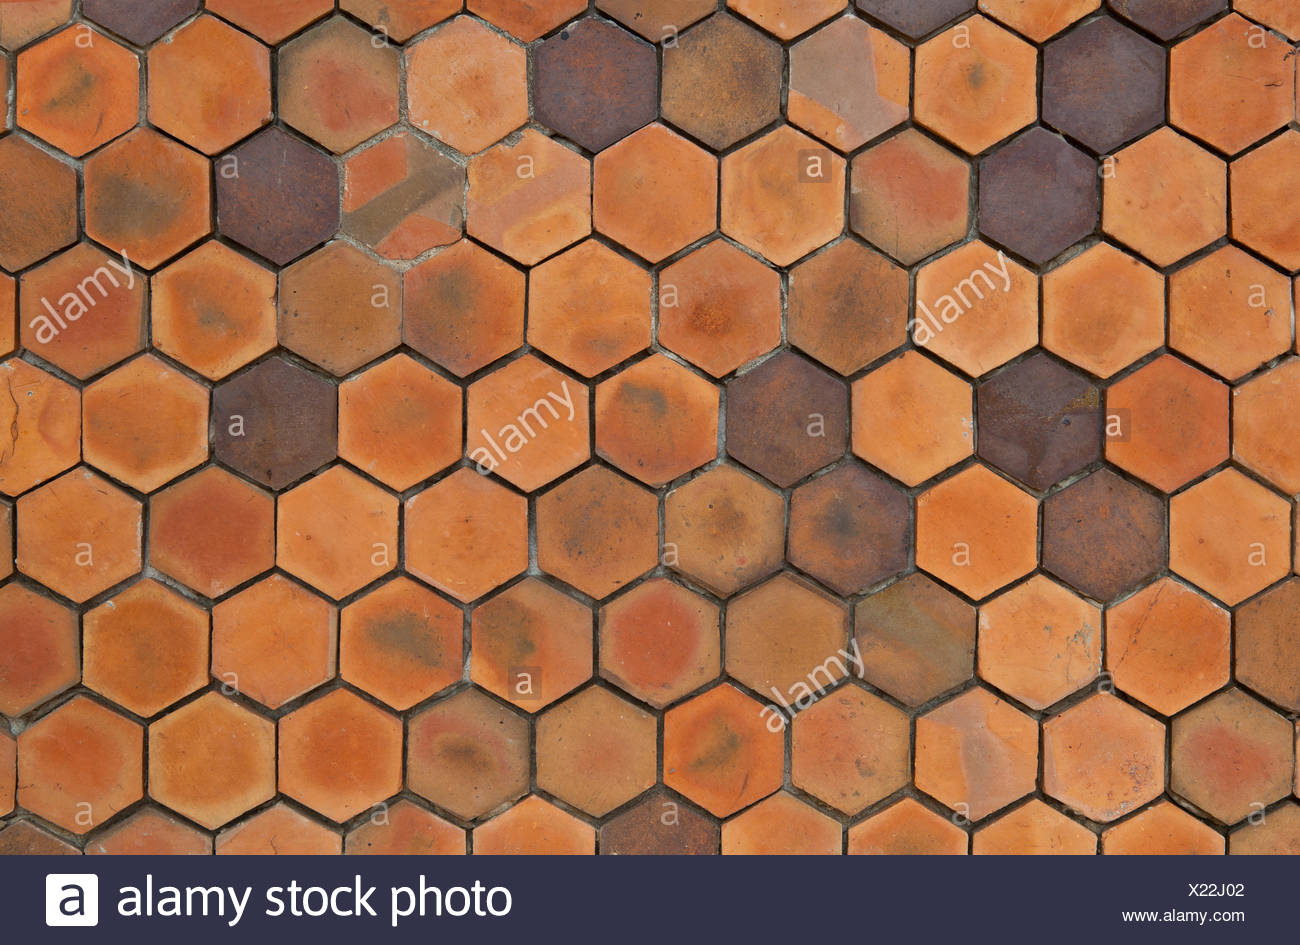 Giallo argilla esagonale parete piastrelle sfondo nido tile parete